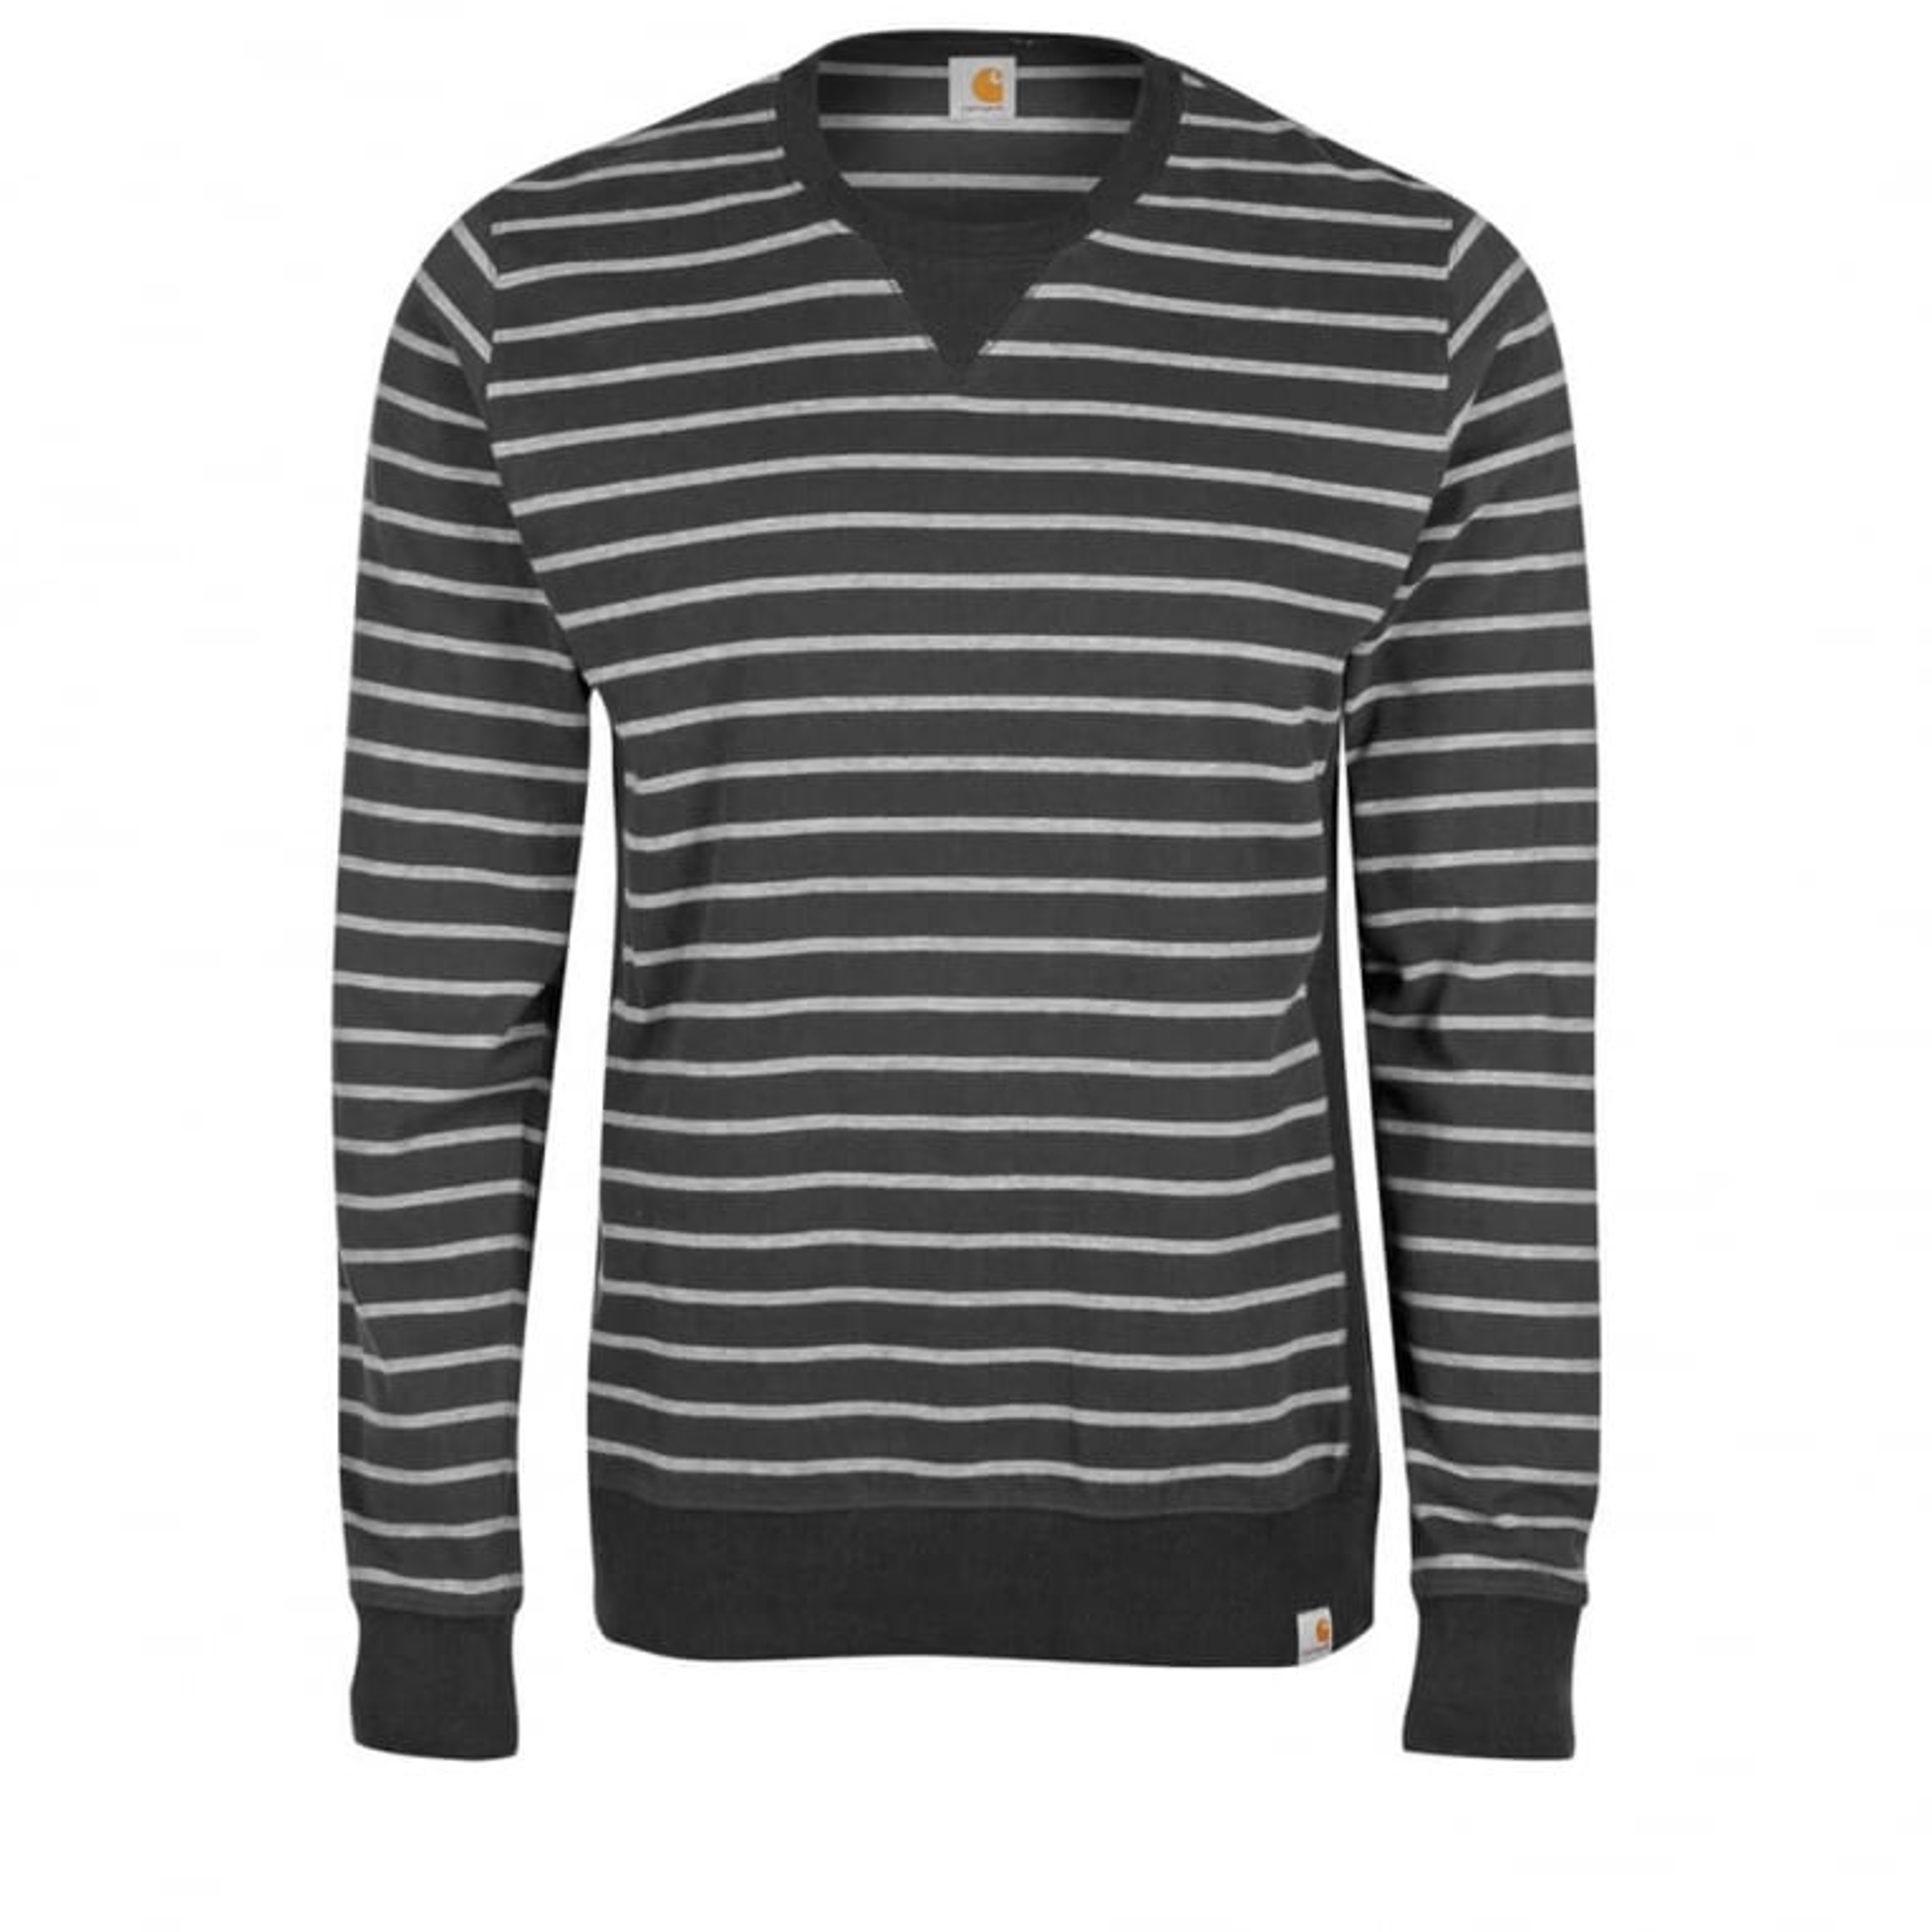 Carhartt WIP Counsel Crewneck Sweatshirt - Black/Grey